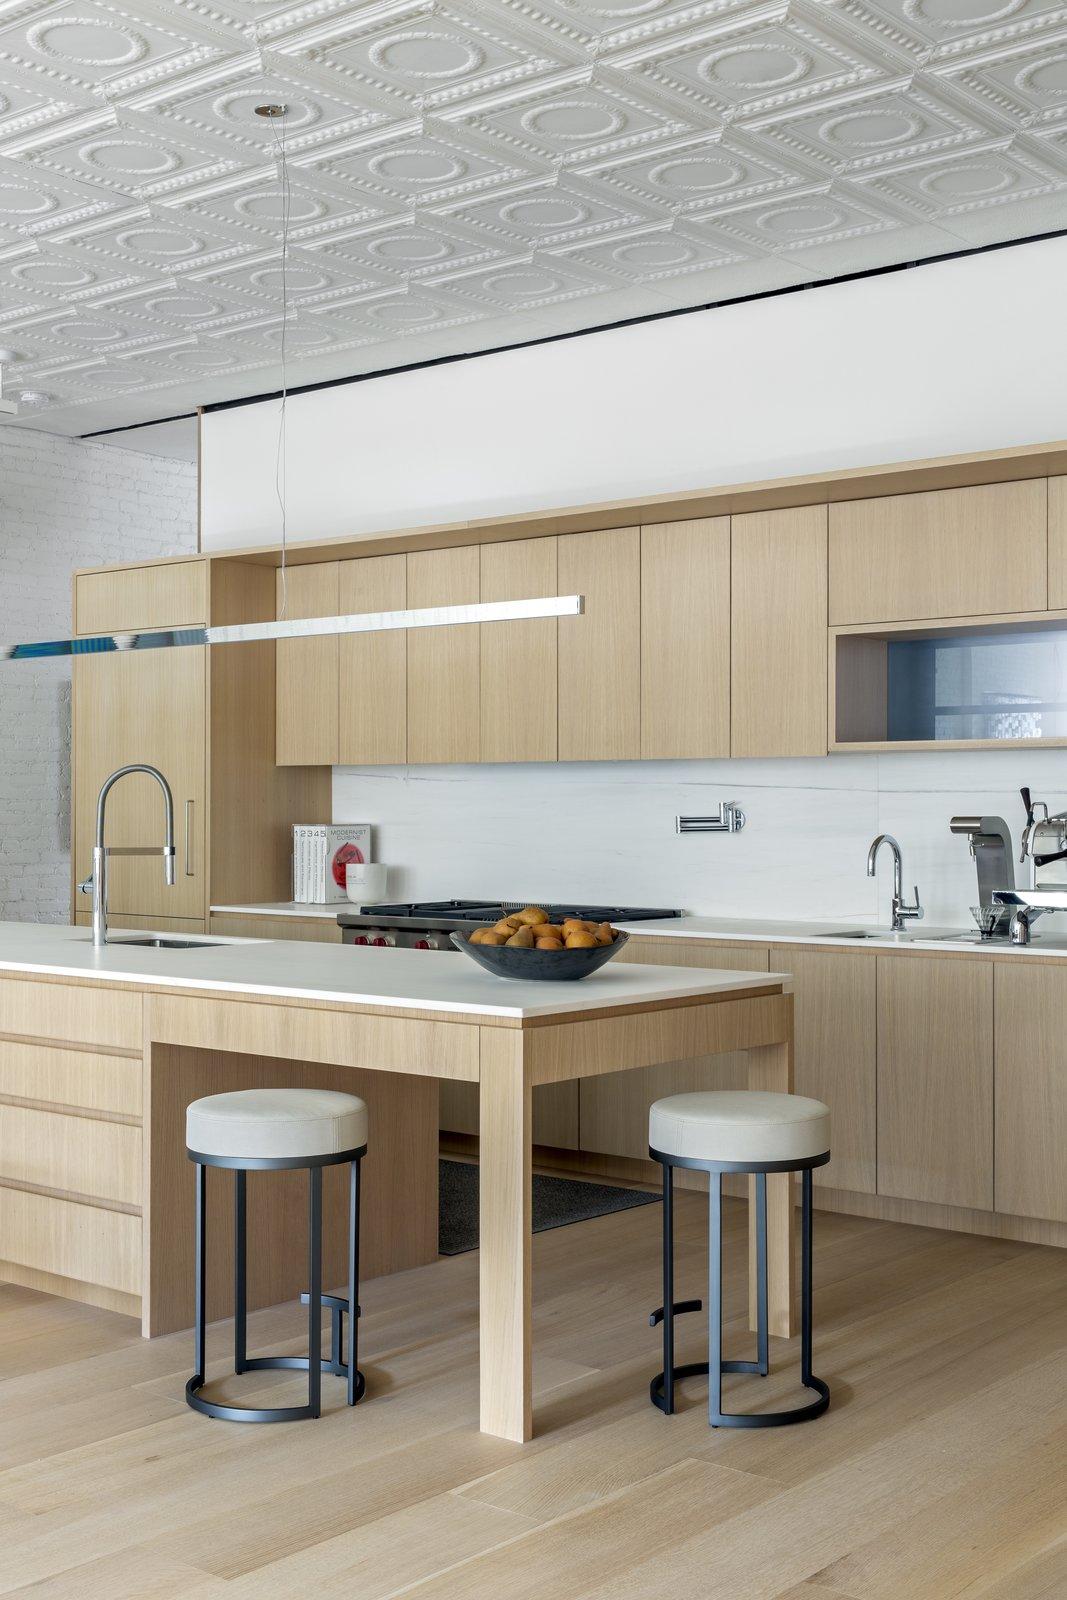 Soho Cast Iron Loft kitchen